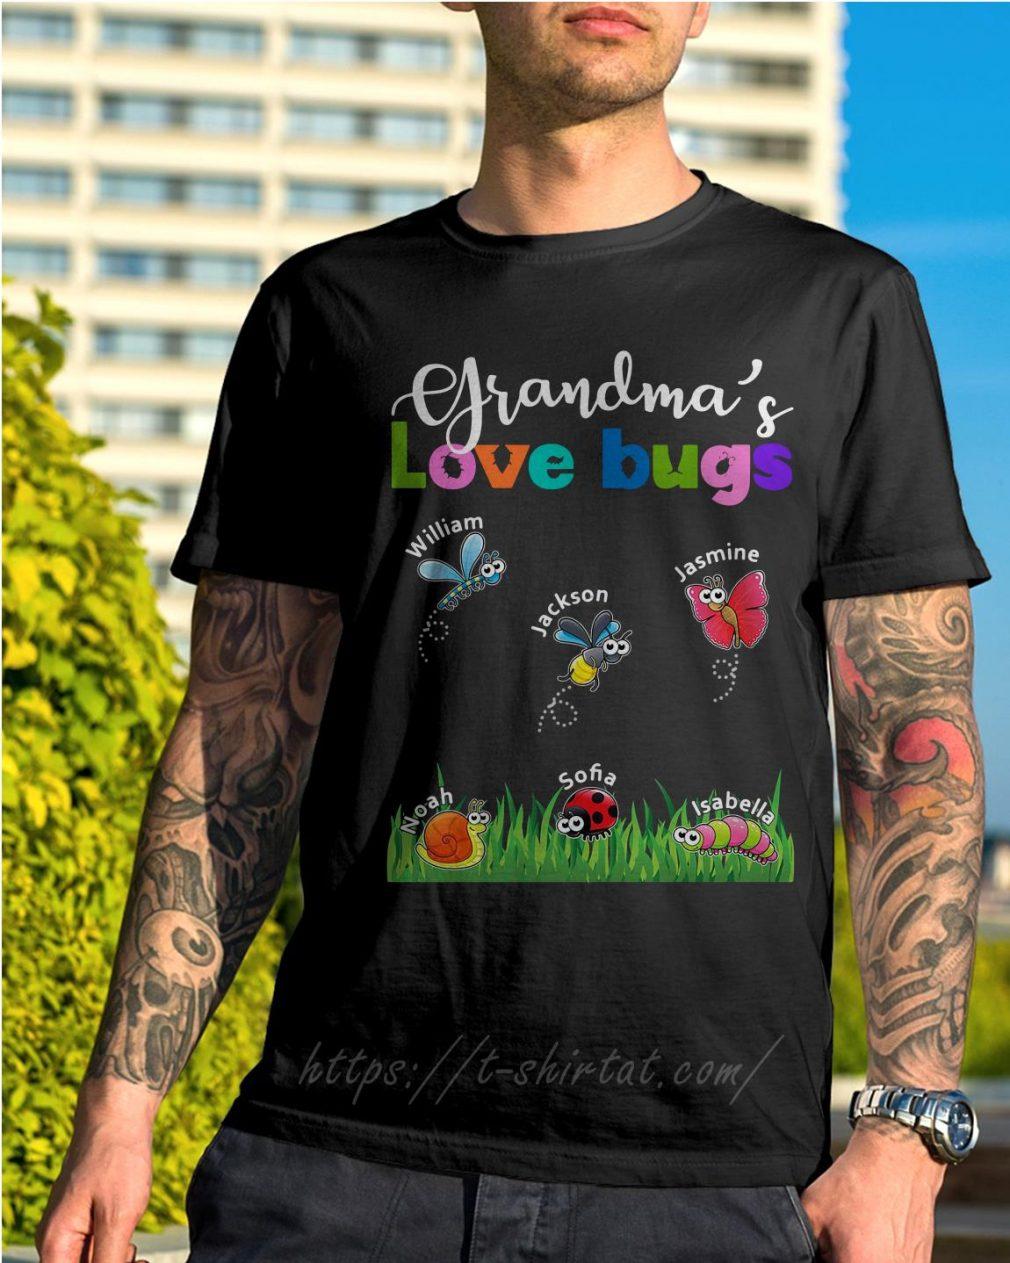 Grandma's love bugs William Jackson Jasmine Noah Sofia Isabella shirt